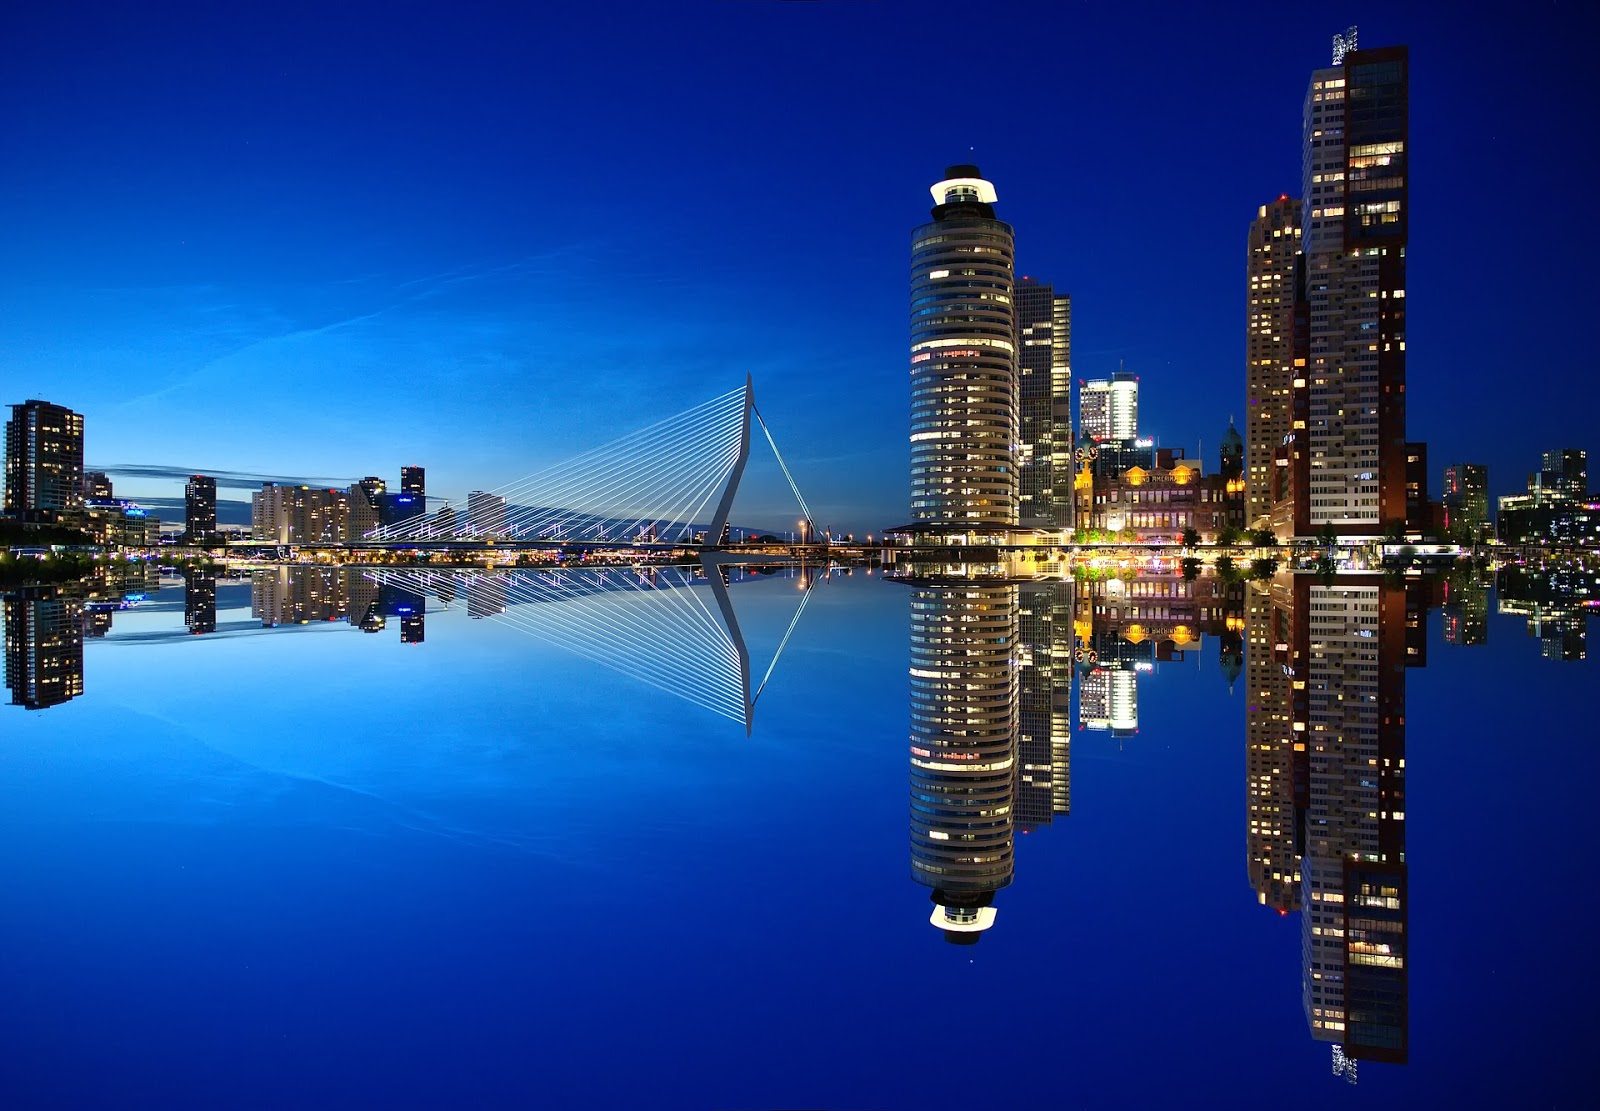 Image: Rotterdam Skyline via Pixabay